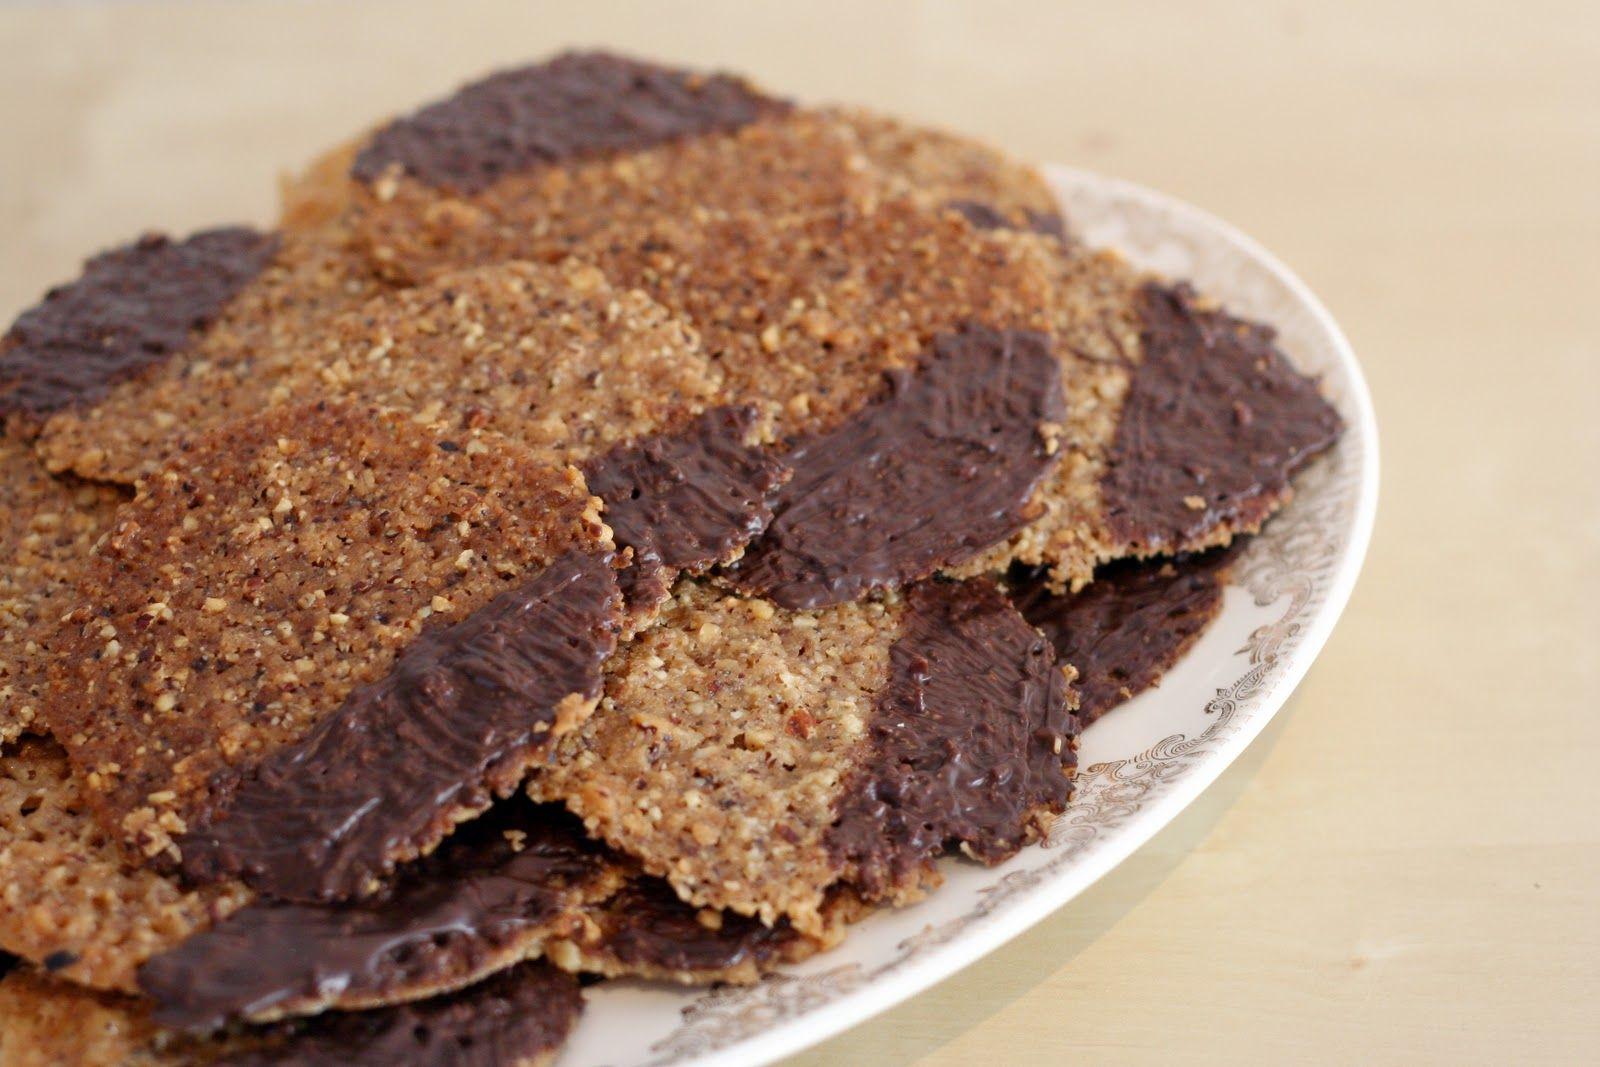 Chocolate Dipped Hazelnut Lace Cookie Recipe